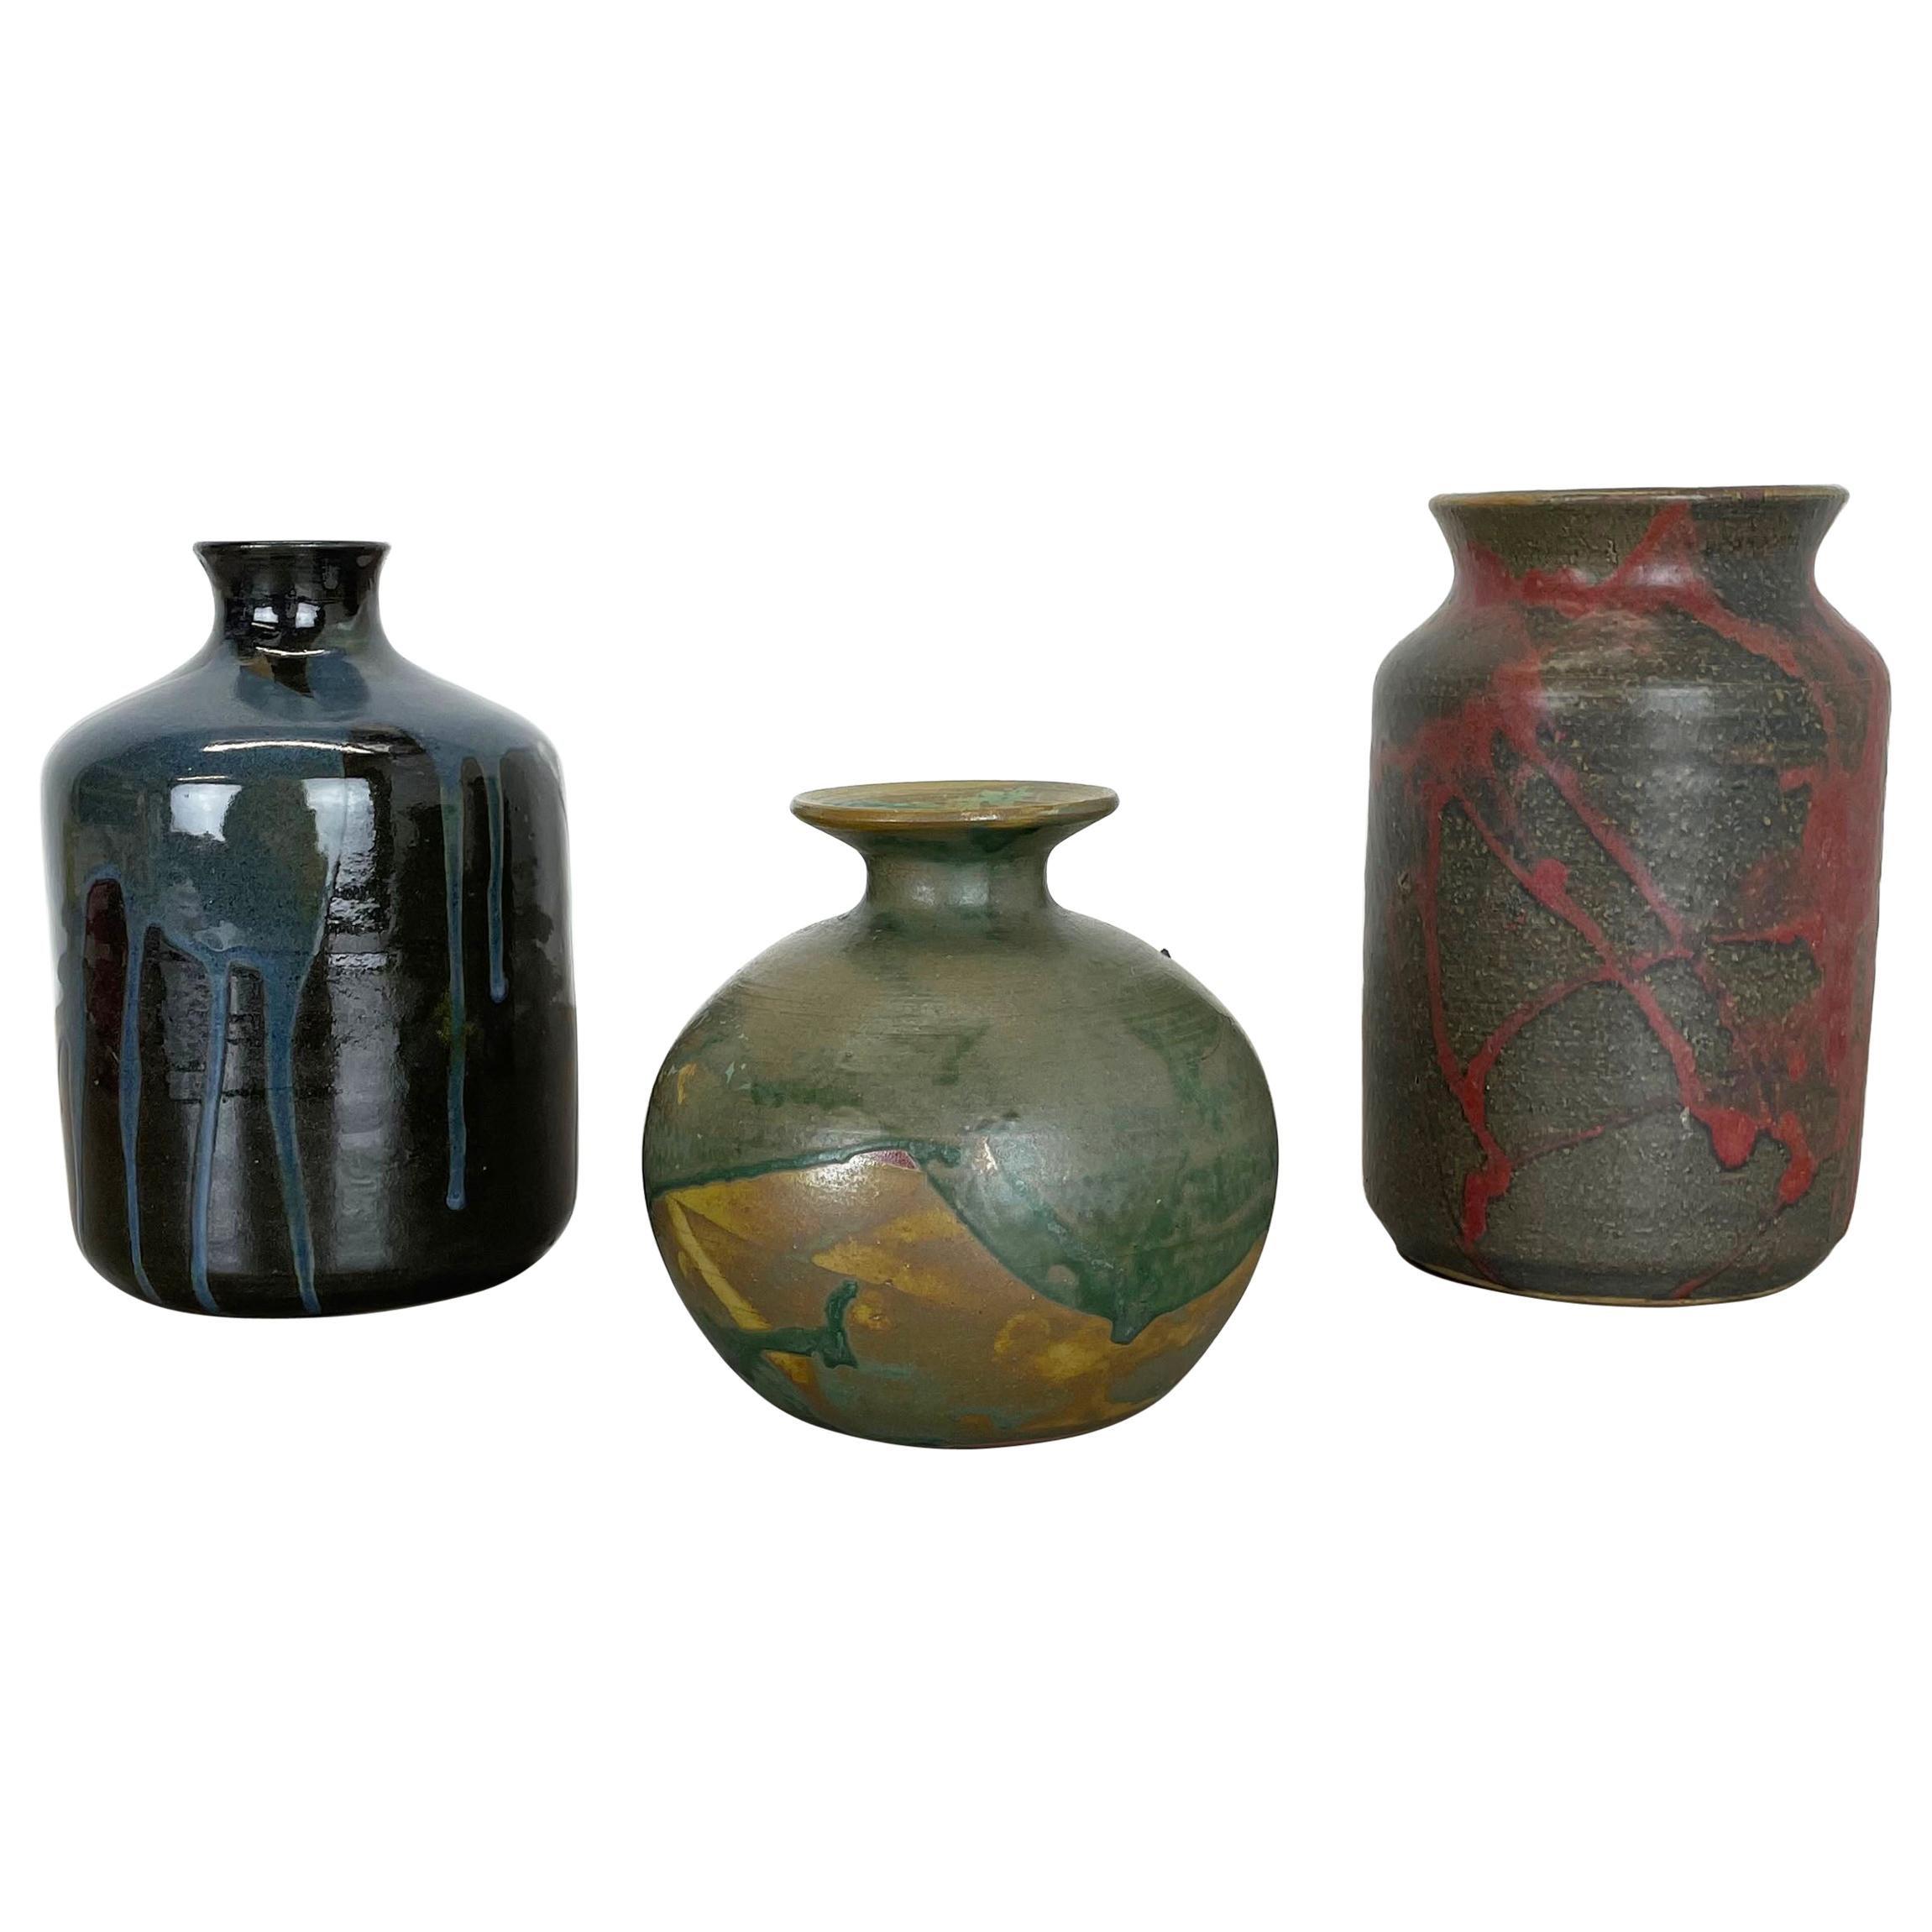 Set of 3 Ceramic Studio Pottery Vase by Elmar & Elke Kubicek, Germany, 1970s